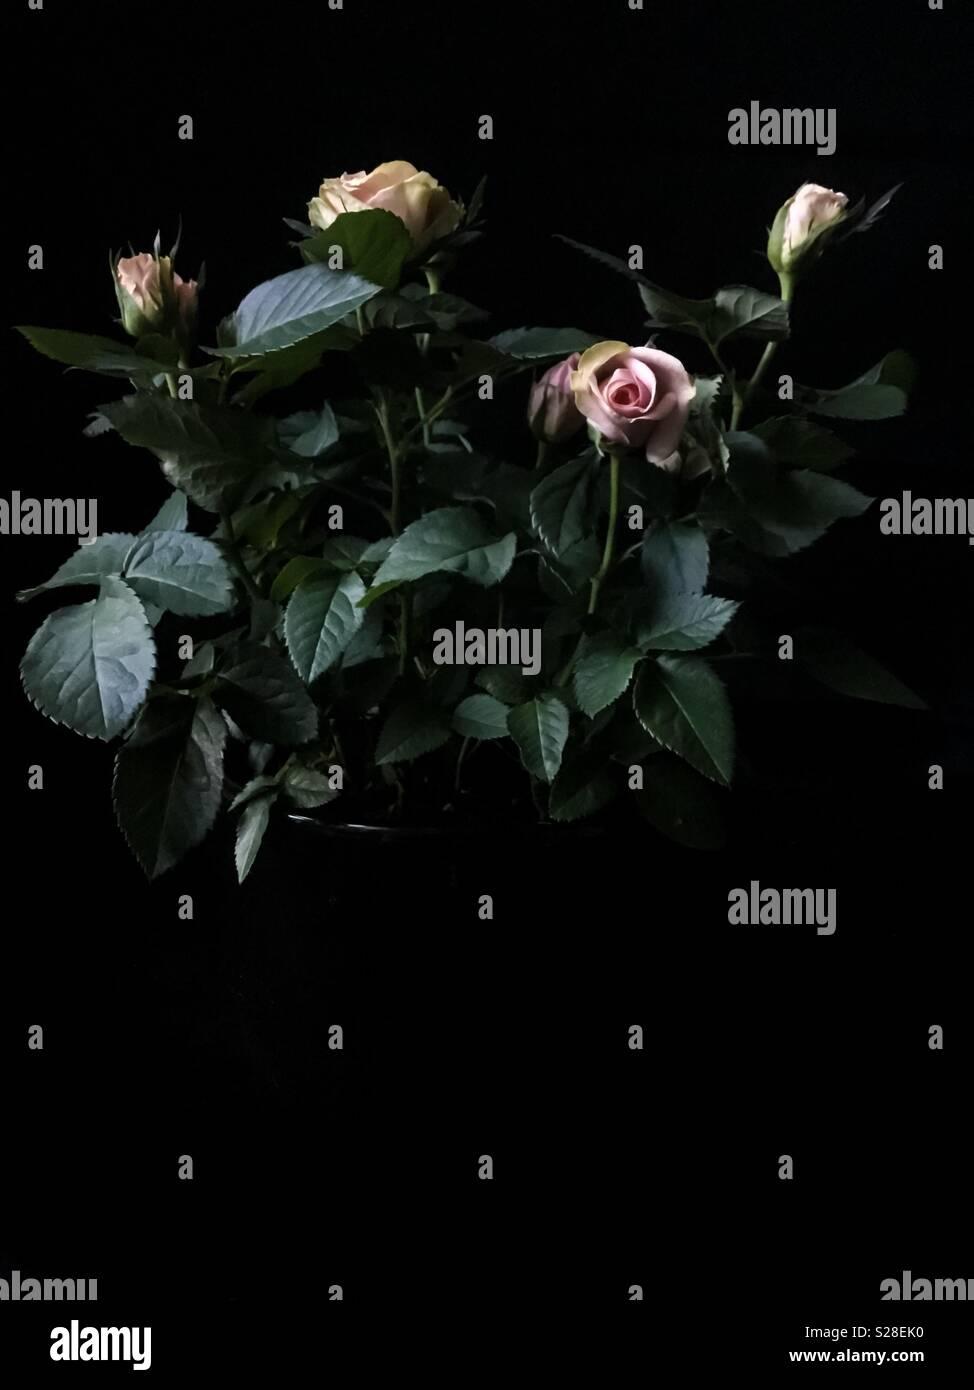 Buisson rose rose sur fond sombre Photo Stock